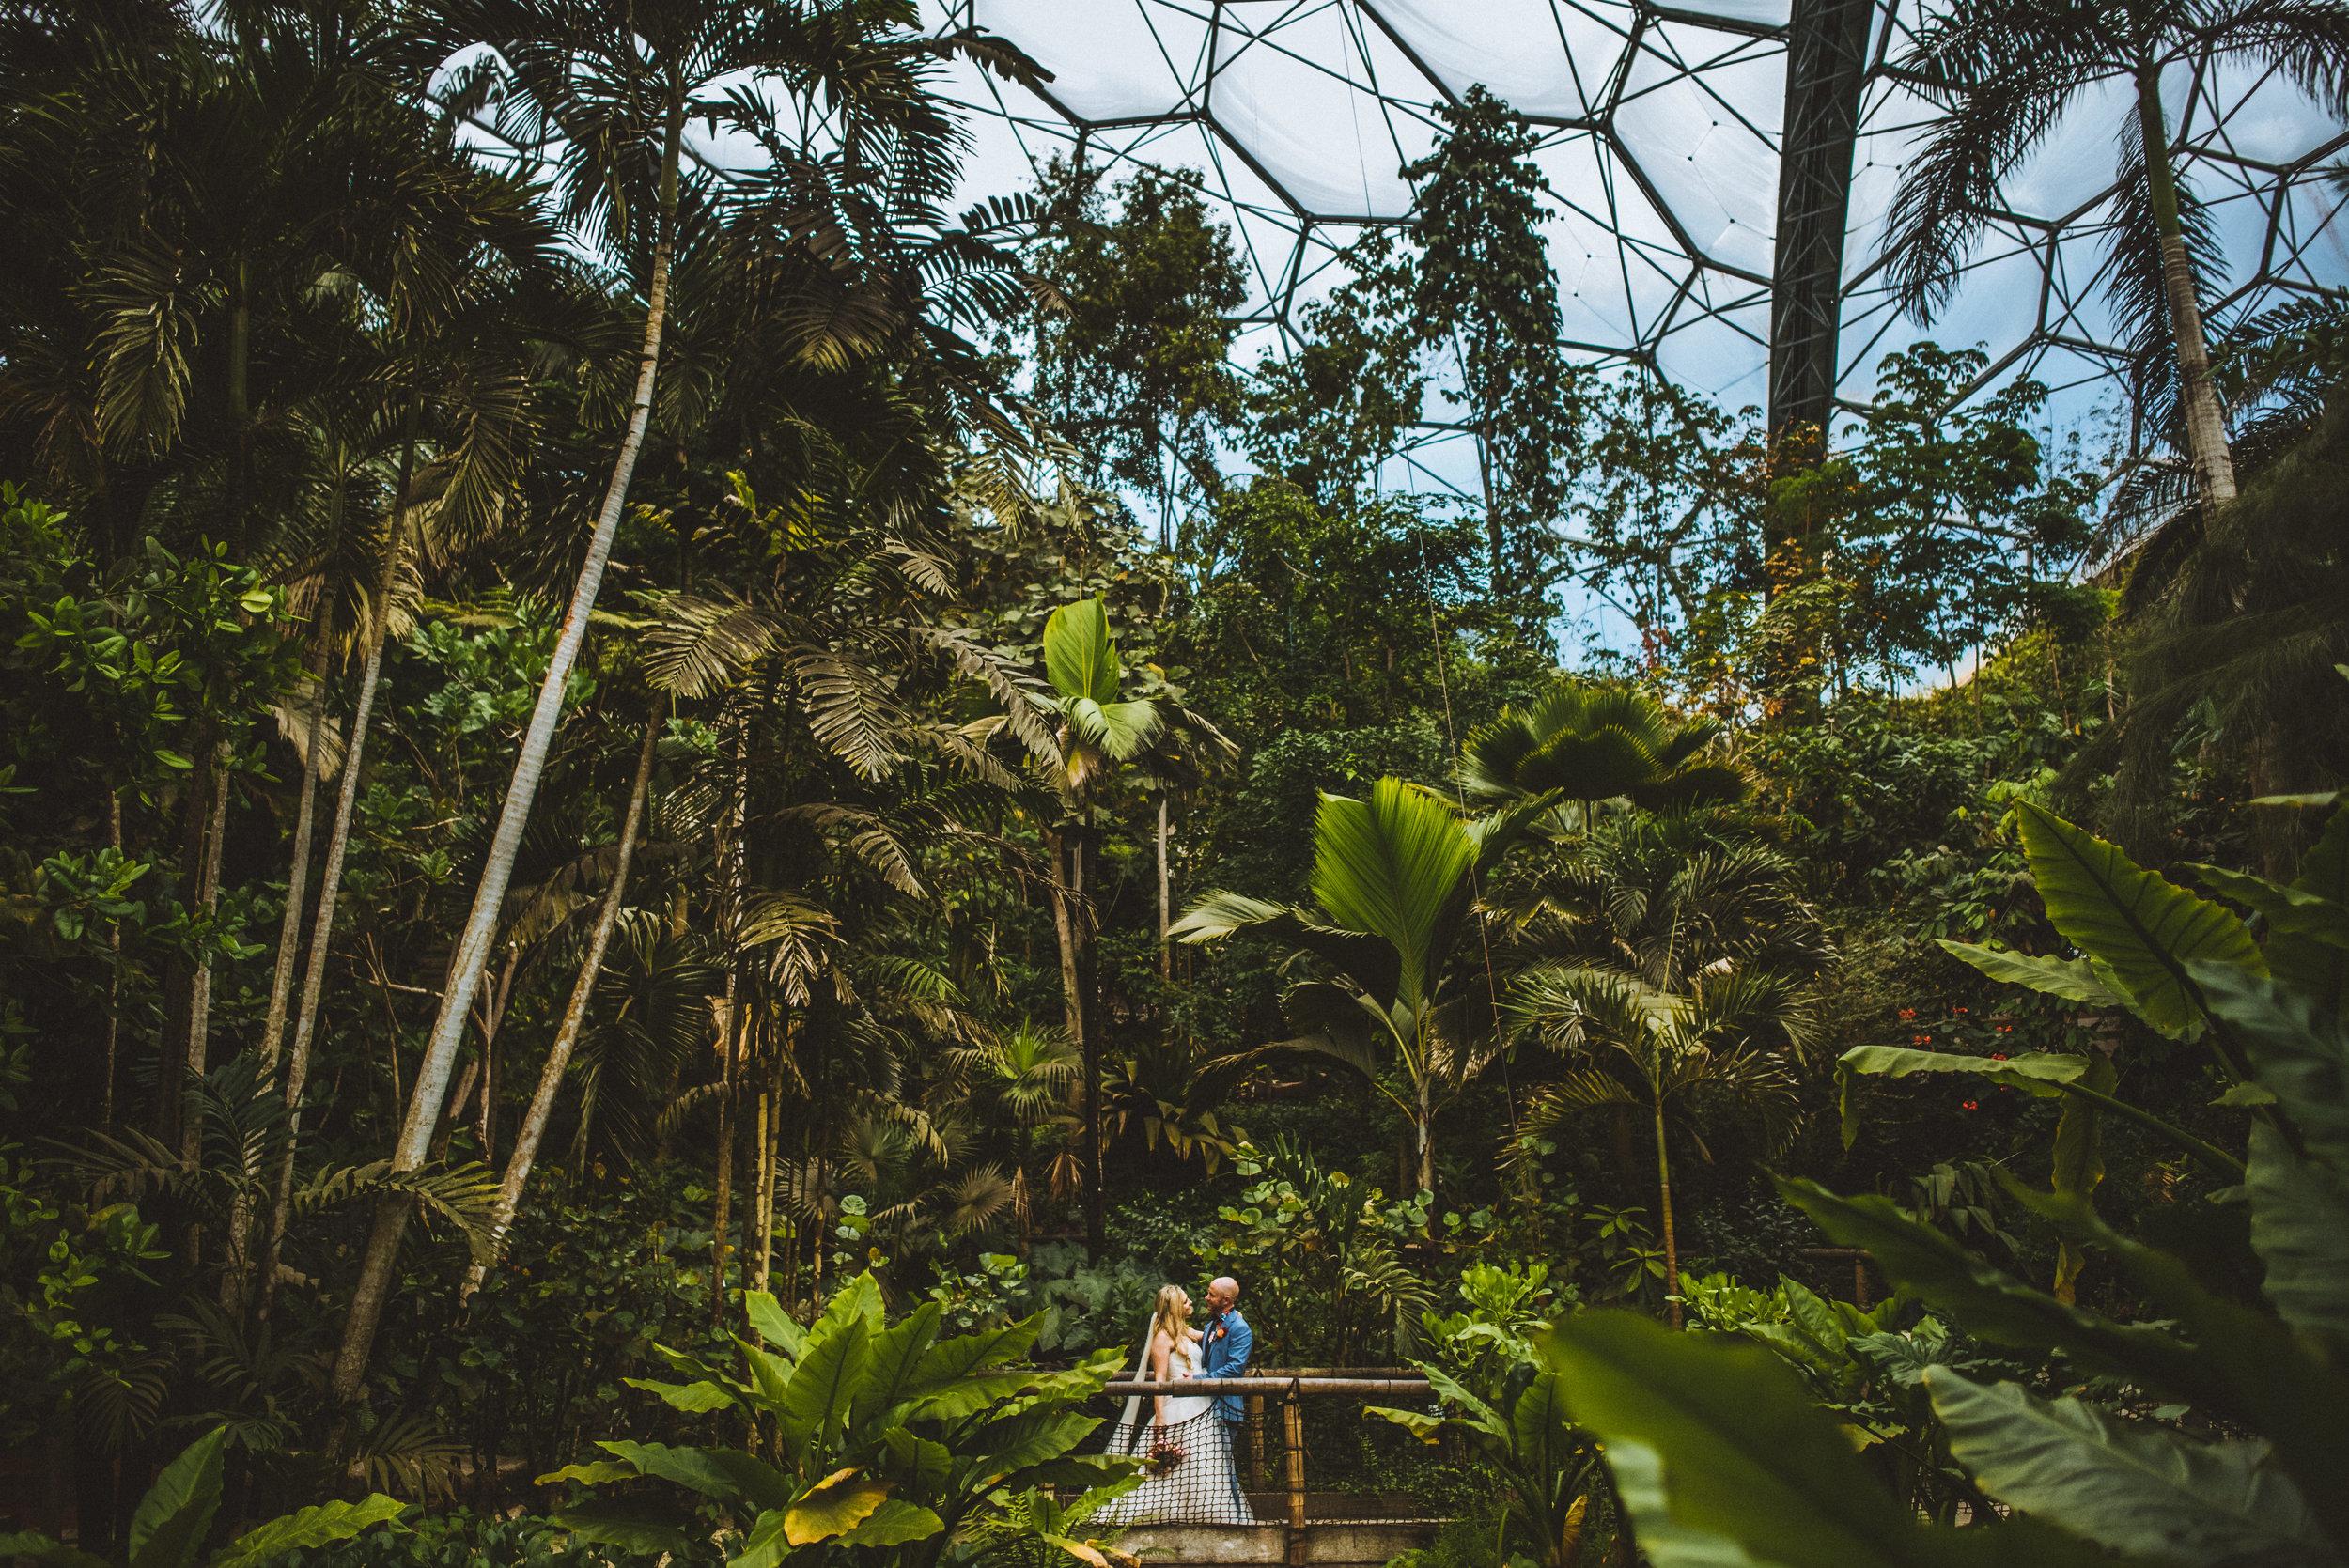 wedding-photographer-eden-project-2.jpg